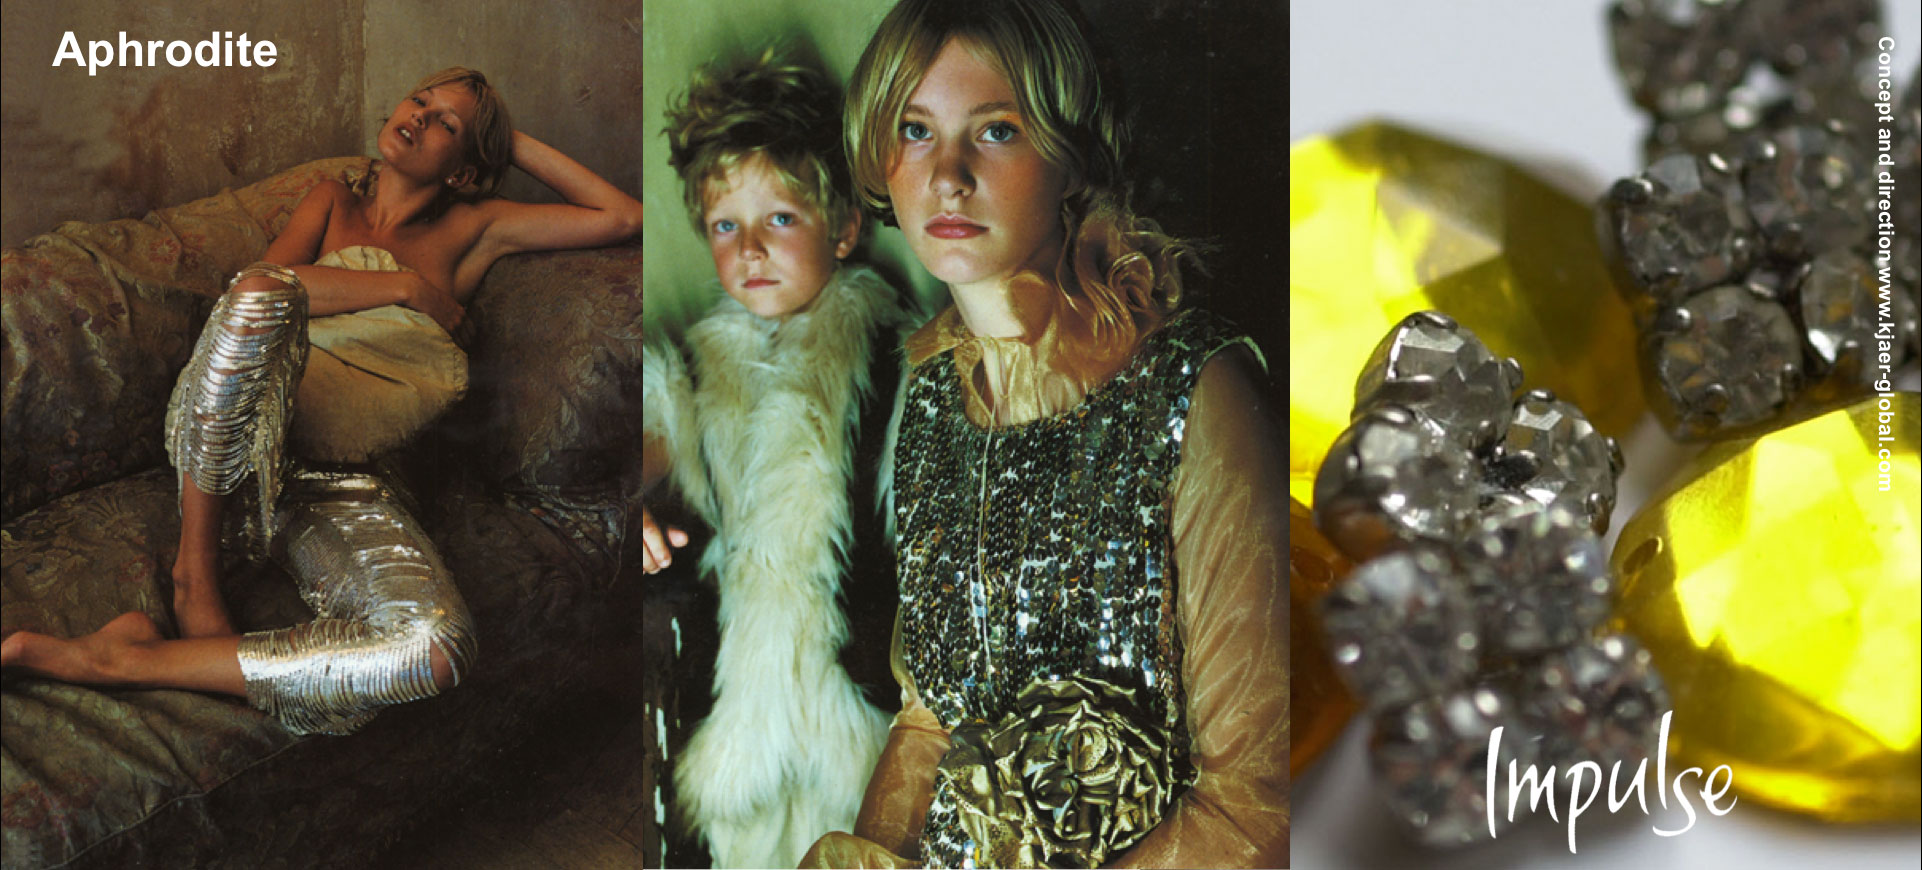 2.-APHRODITE-Kjaer-Global-Unilever_Lever-Fabergé-Impulse-New-Launch-2001